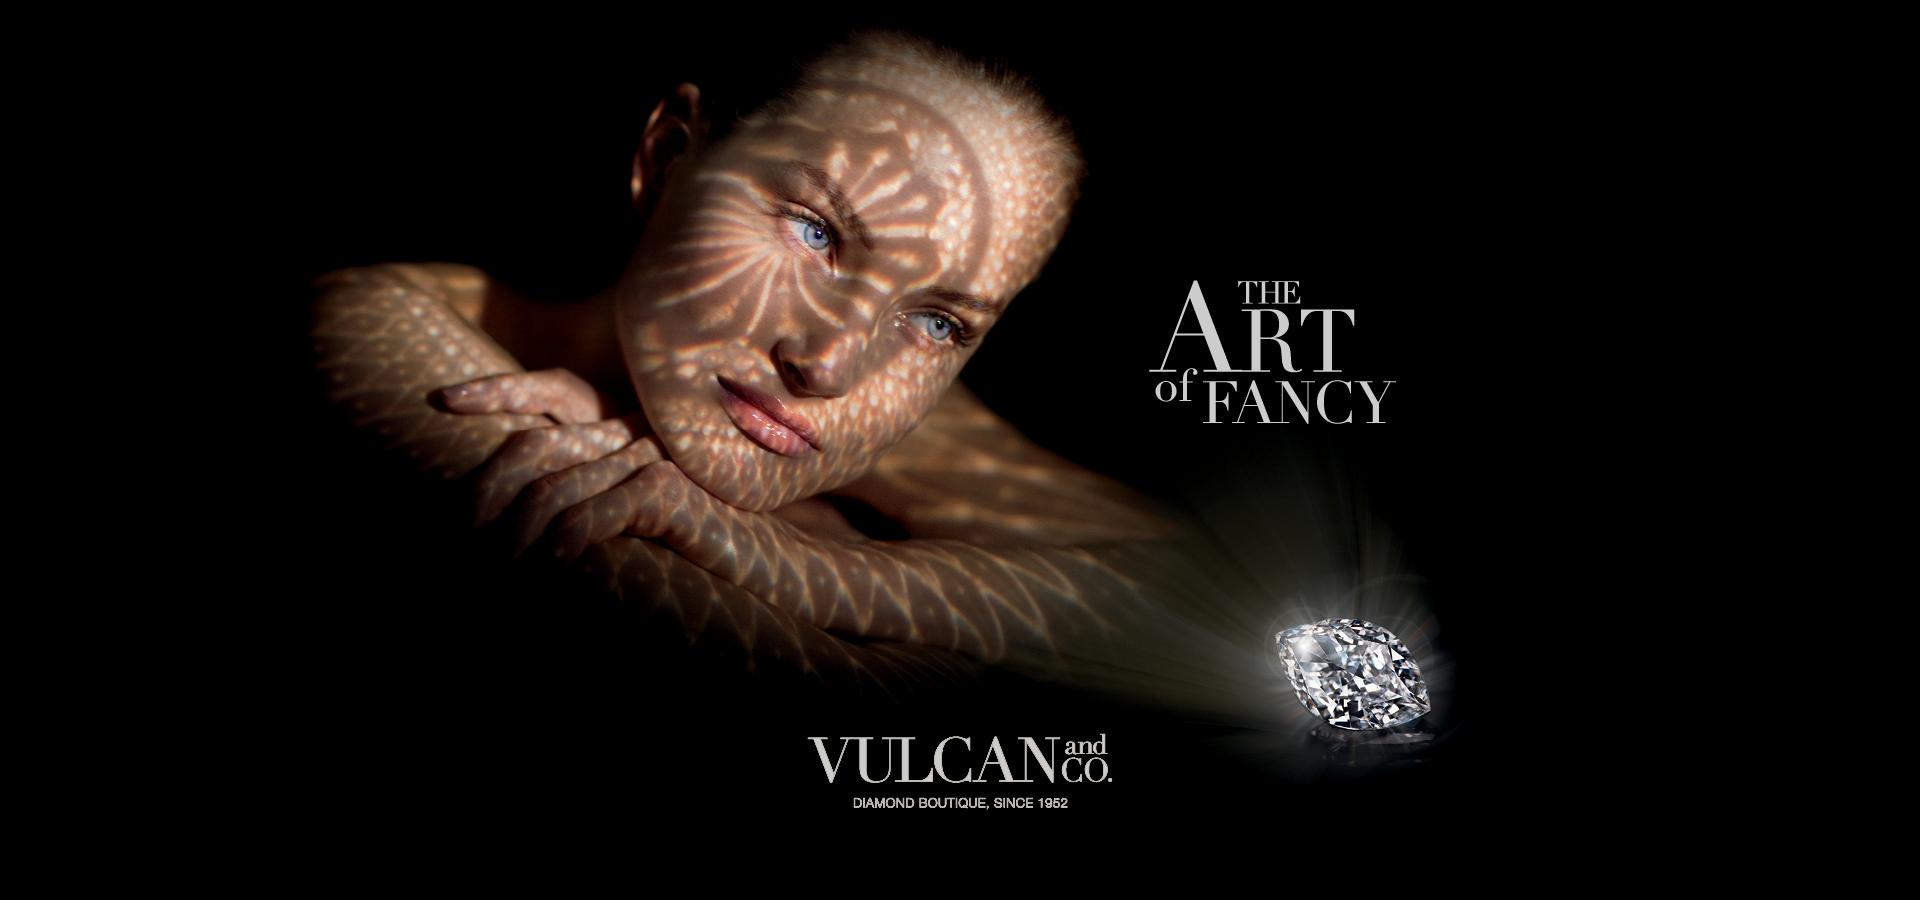 Vulcan & Co